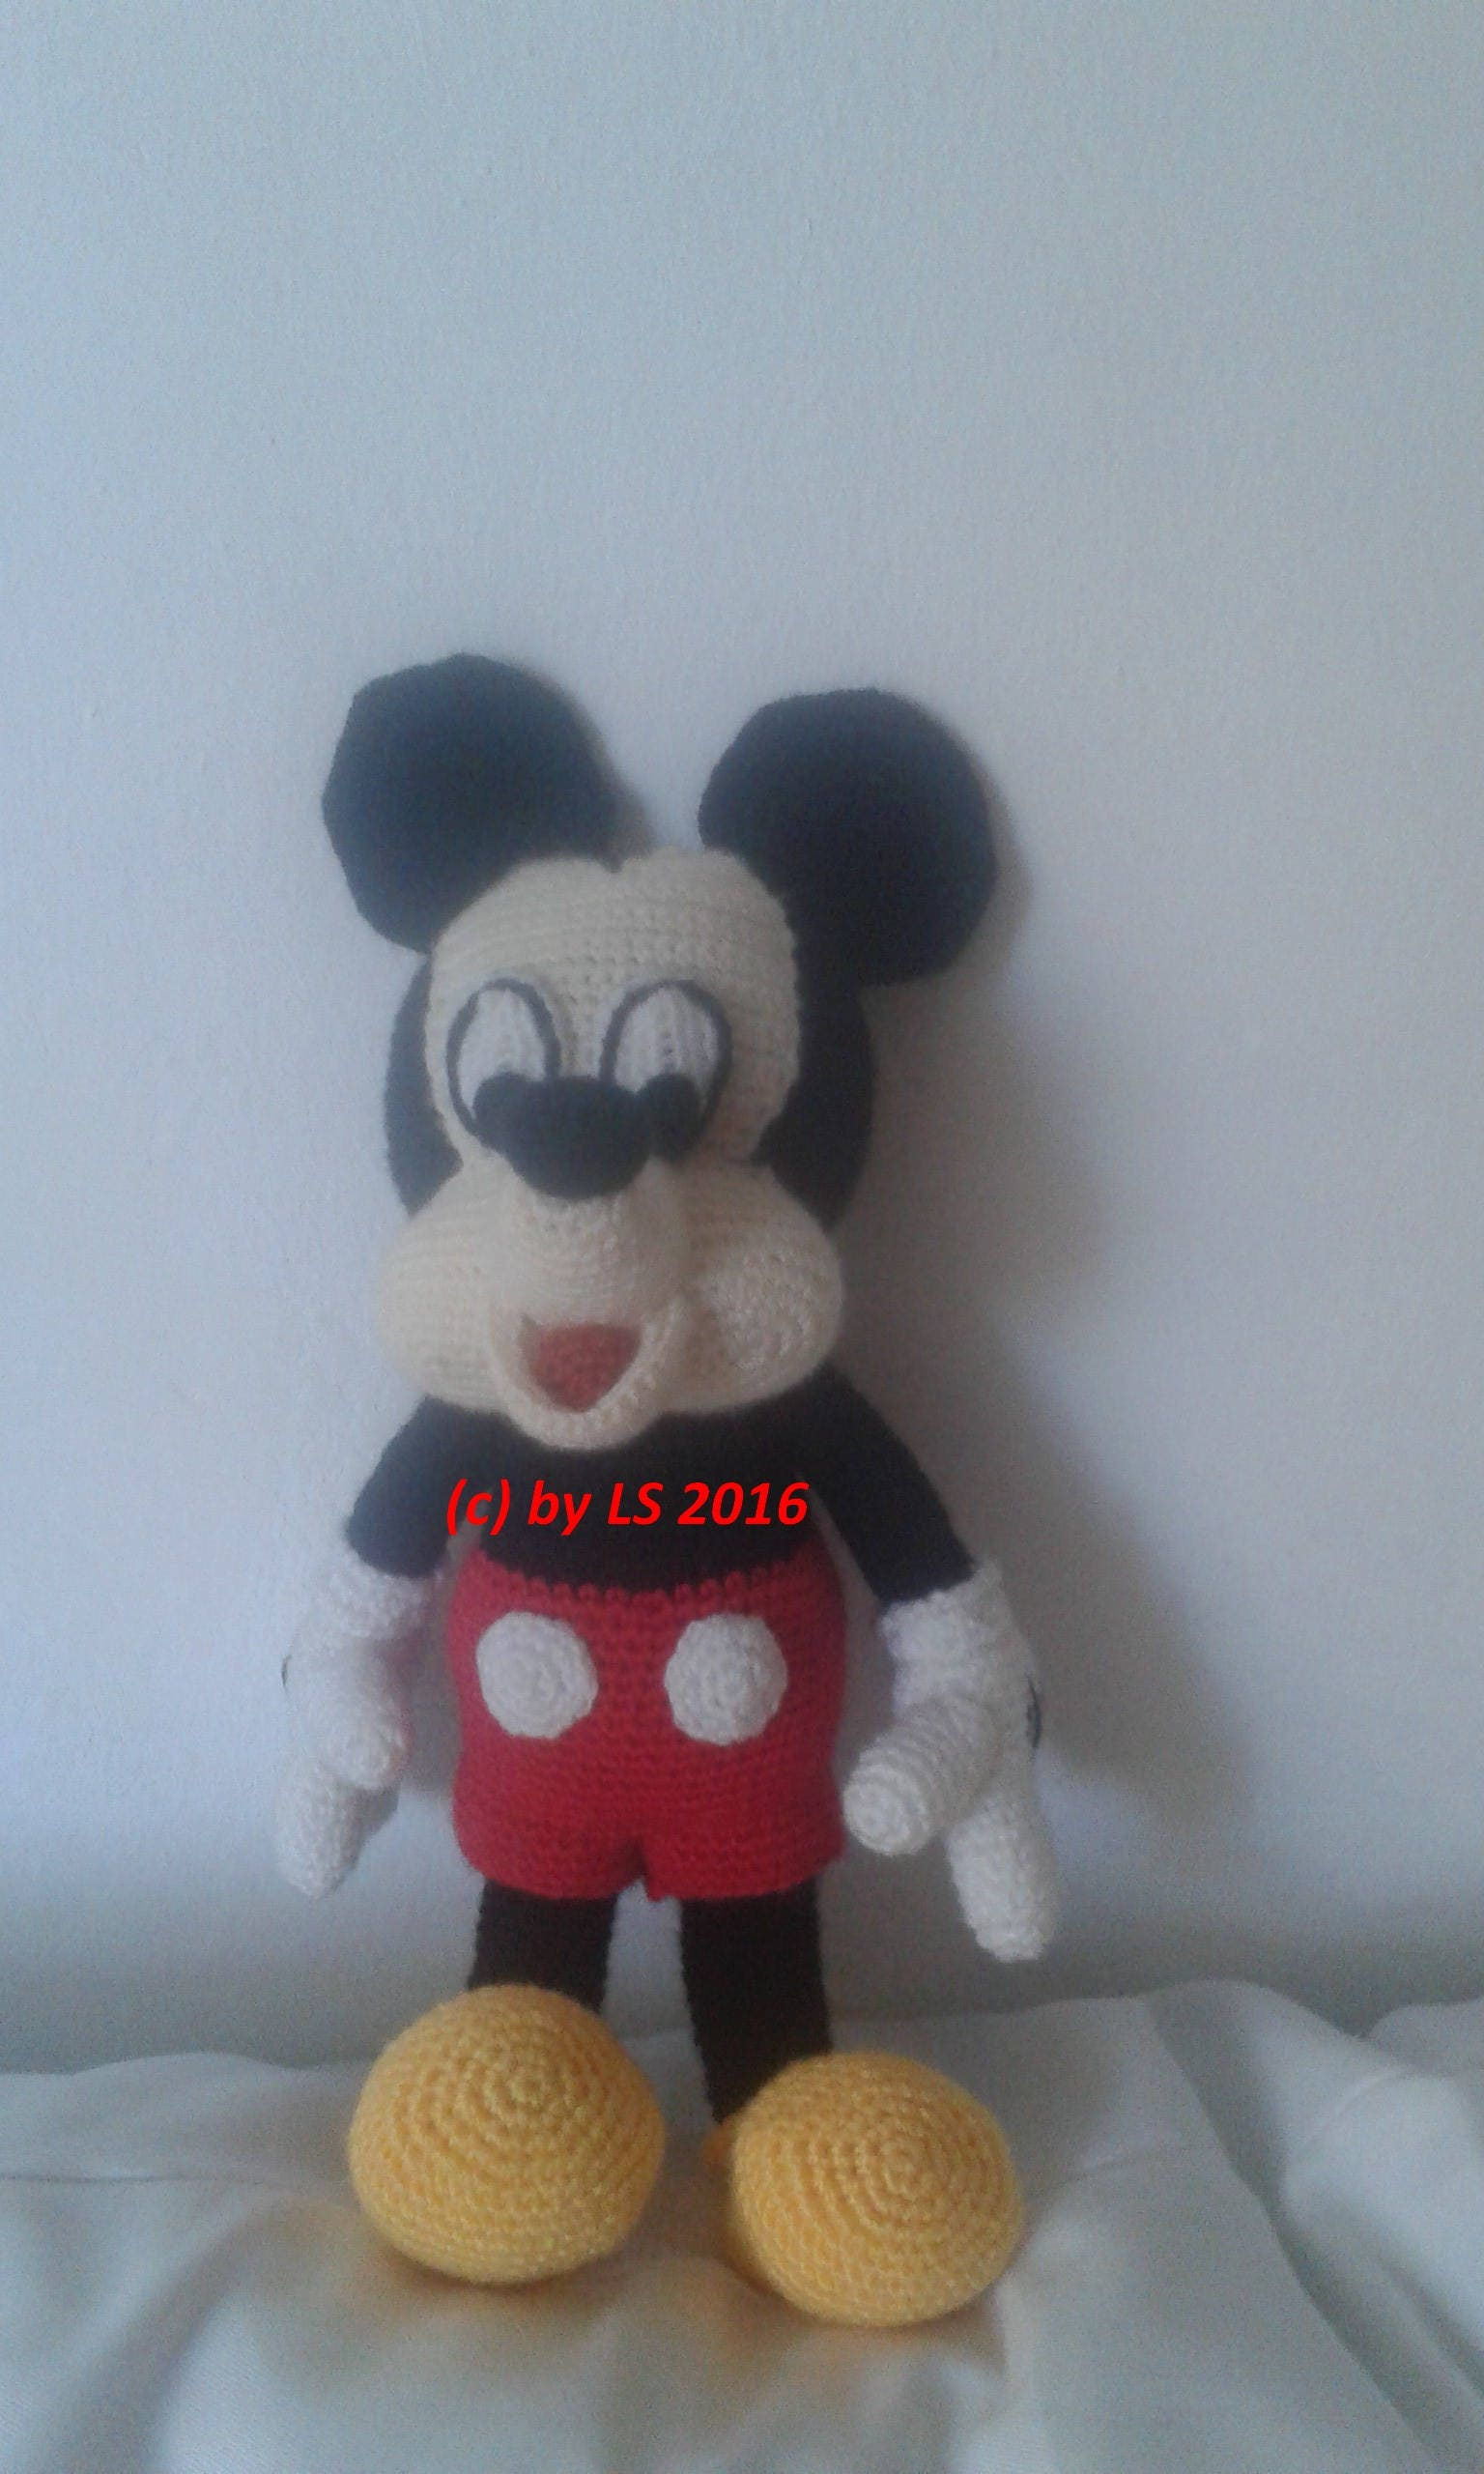 Dorable Mickey Maus Baby Häkelmuster Gallery - Decke Stricken Muster ...